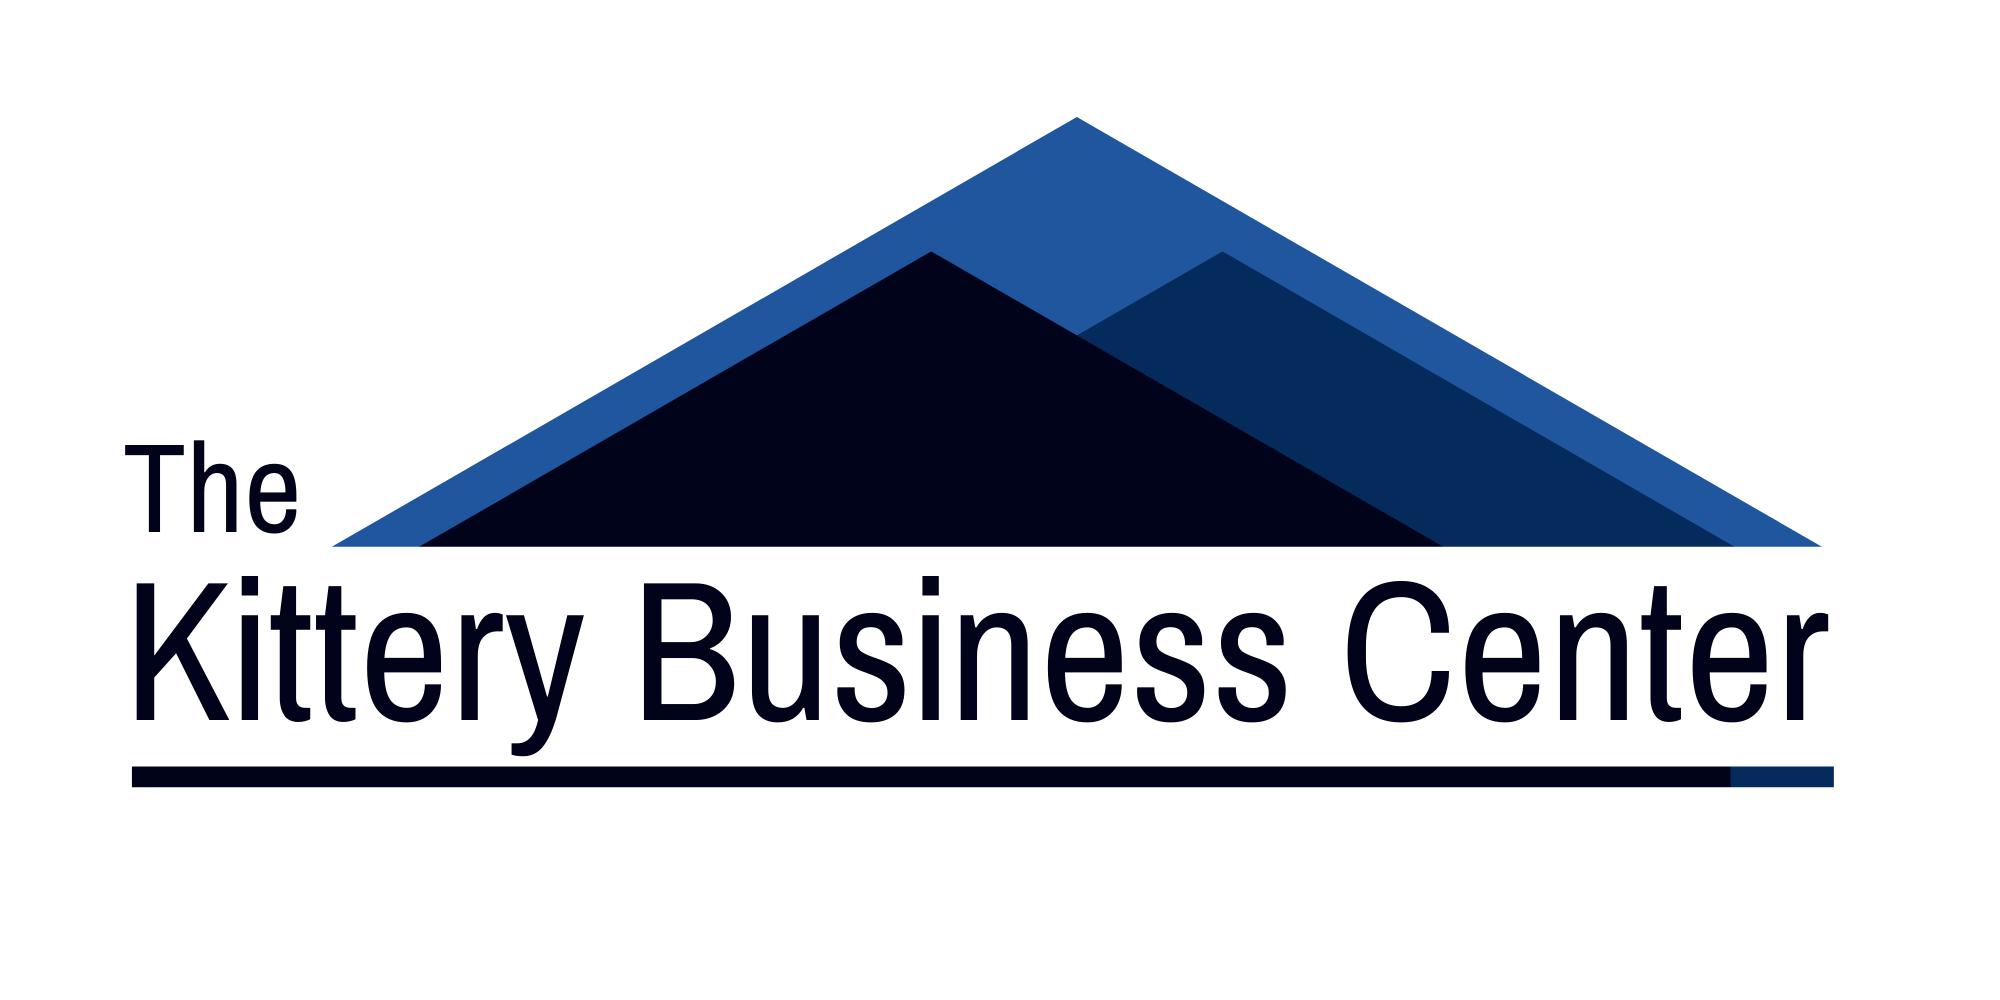 The Kittery Business Center